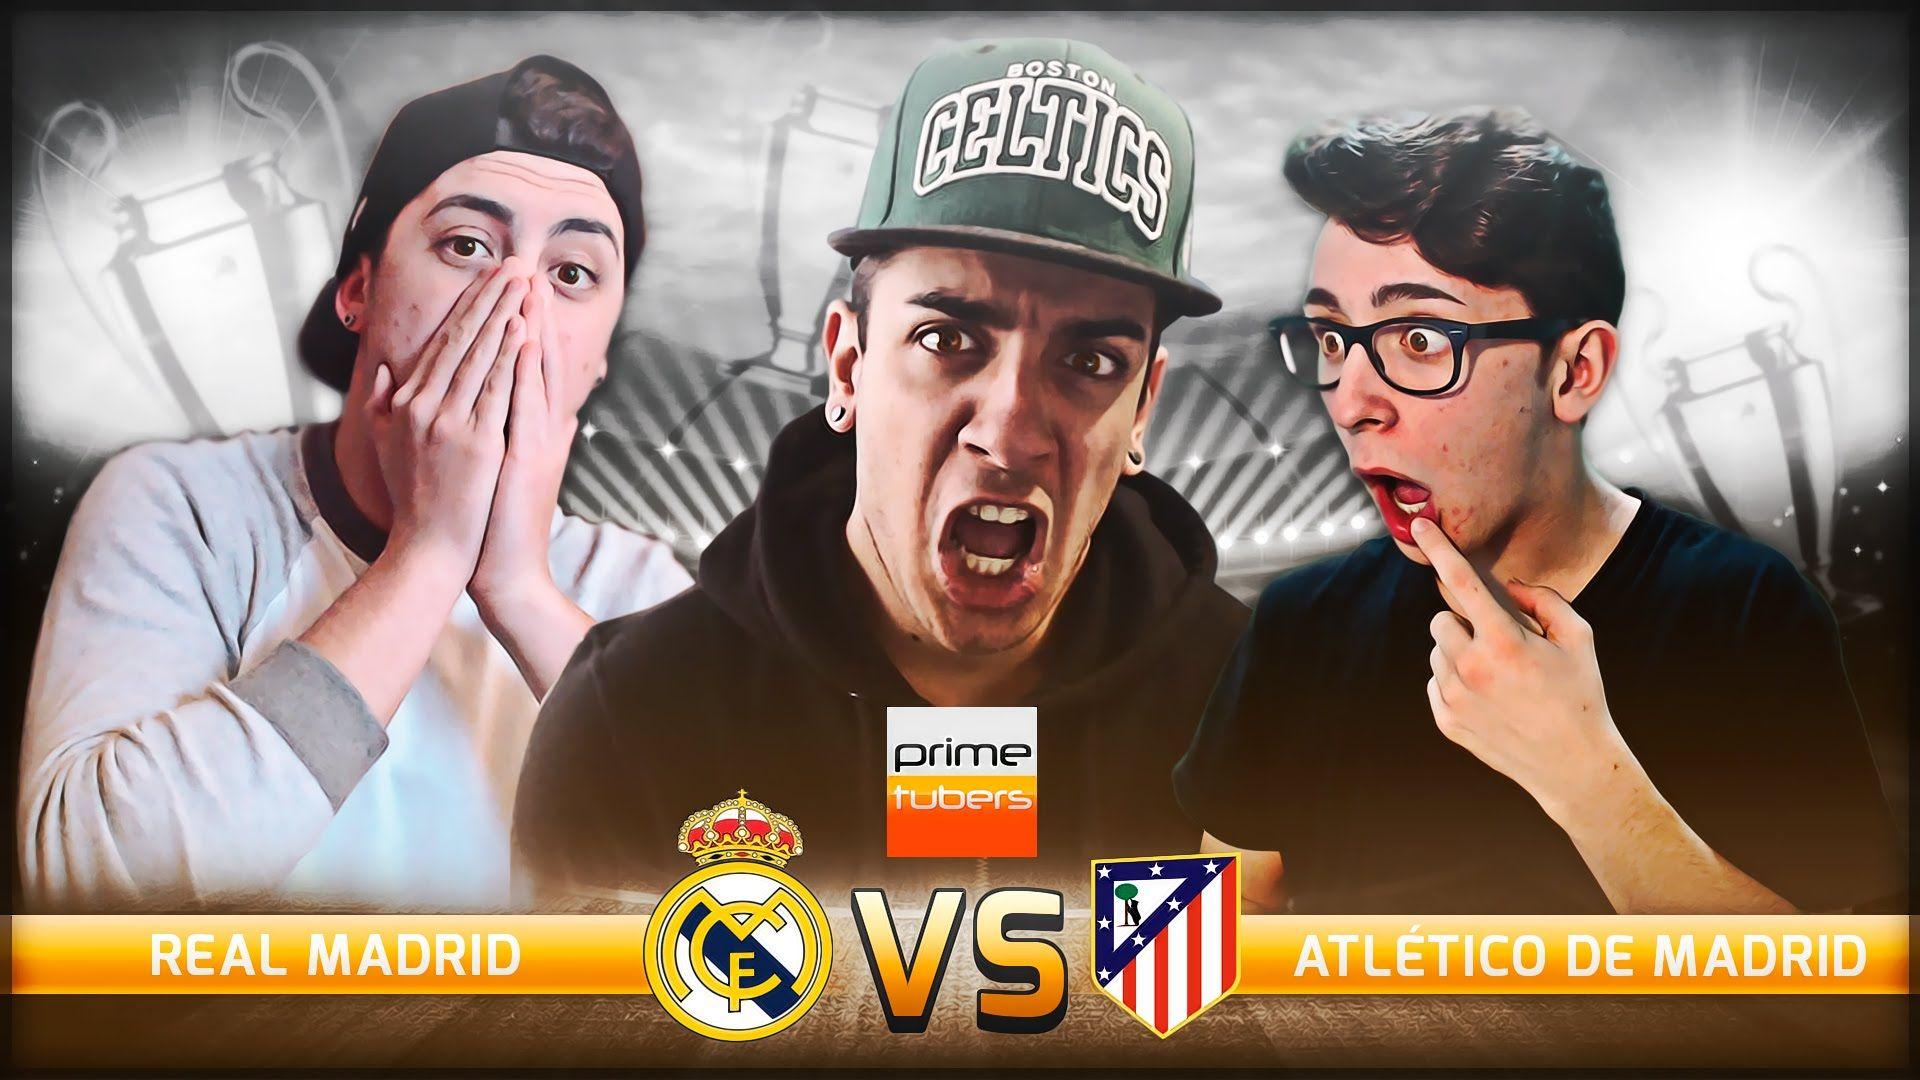 FINAL CHAMPIONS LEAGUE | R.Madrid vs Atl.Madrid | #PrimeTubersEnMilan - http://tickets.fifanz2015.com/final-champions-league-r-madrid-vs-atl-madrid-primetubersenmilan/ #UCLFinal